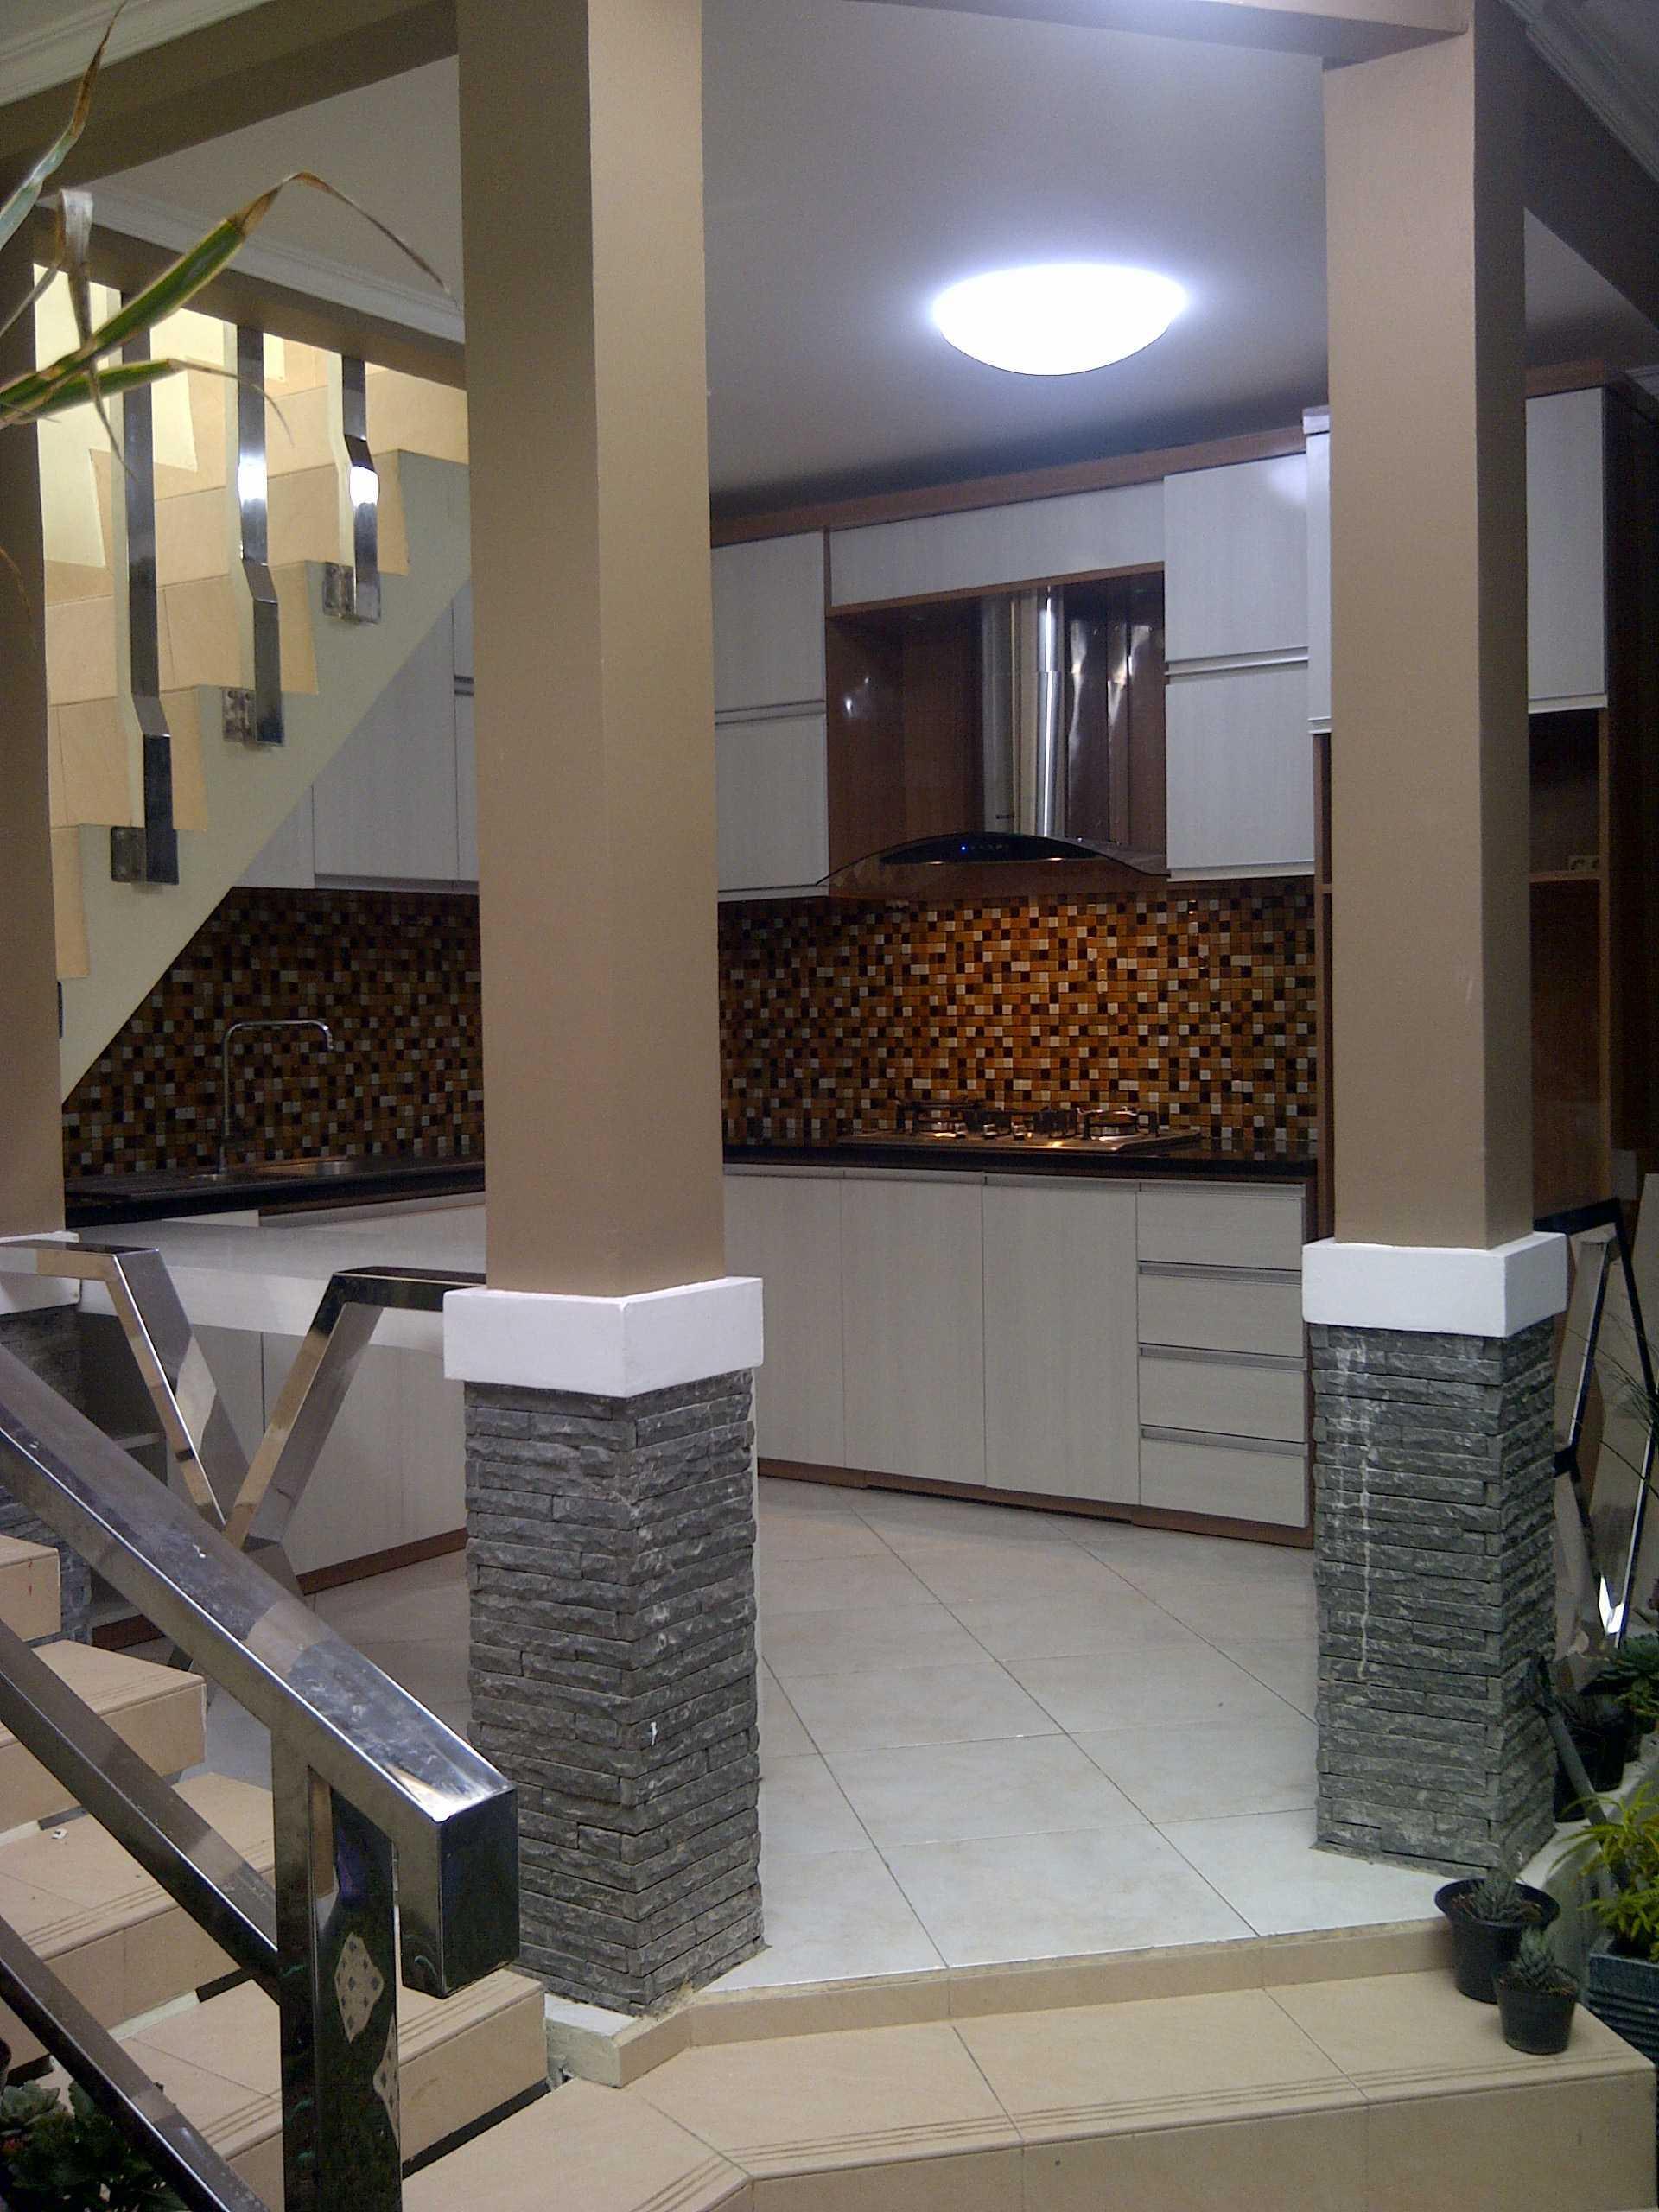 4 Sisi Indonesia Kitchen Set Bandung City, West Java, Indonesia  Img-20130513-00565   34532